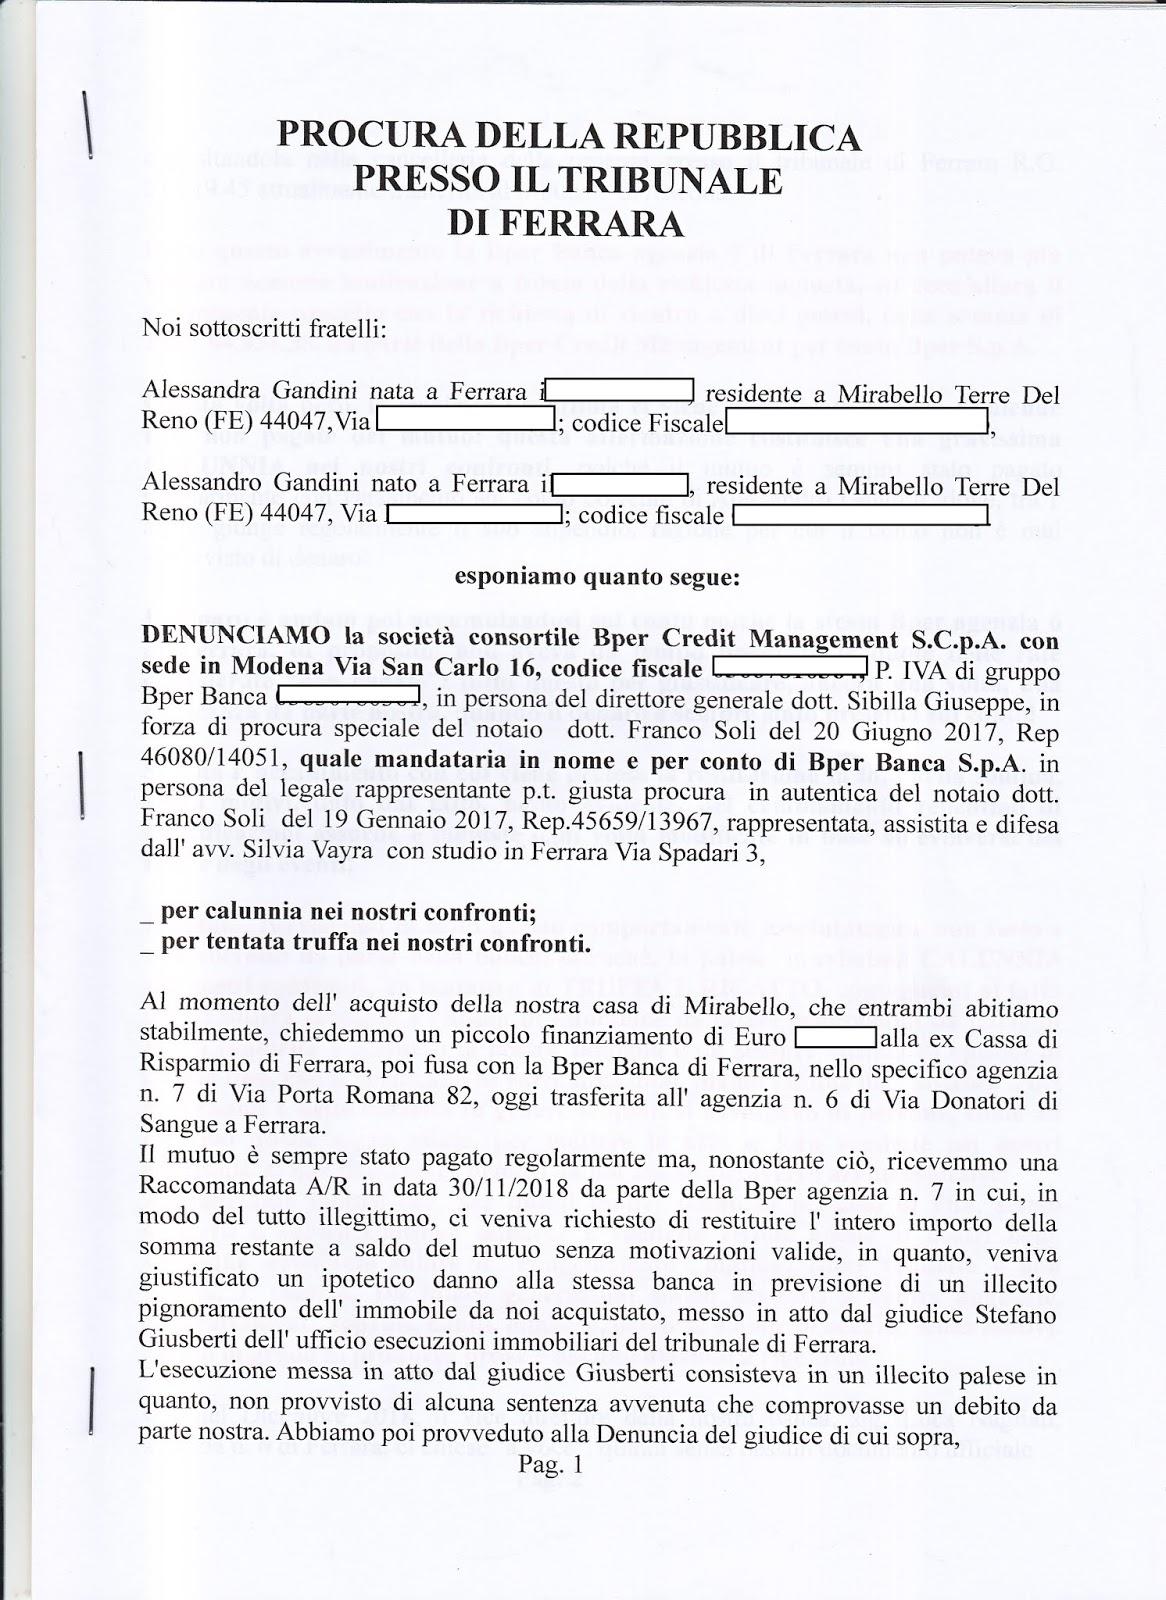 LA FAMIGLIA GANDINI DI FERRARA. STORIA ATROCE DI ...